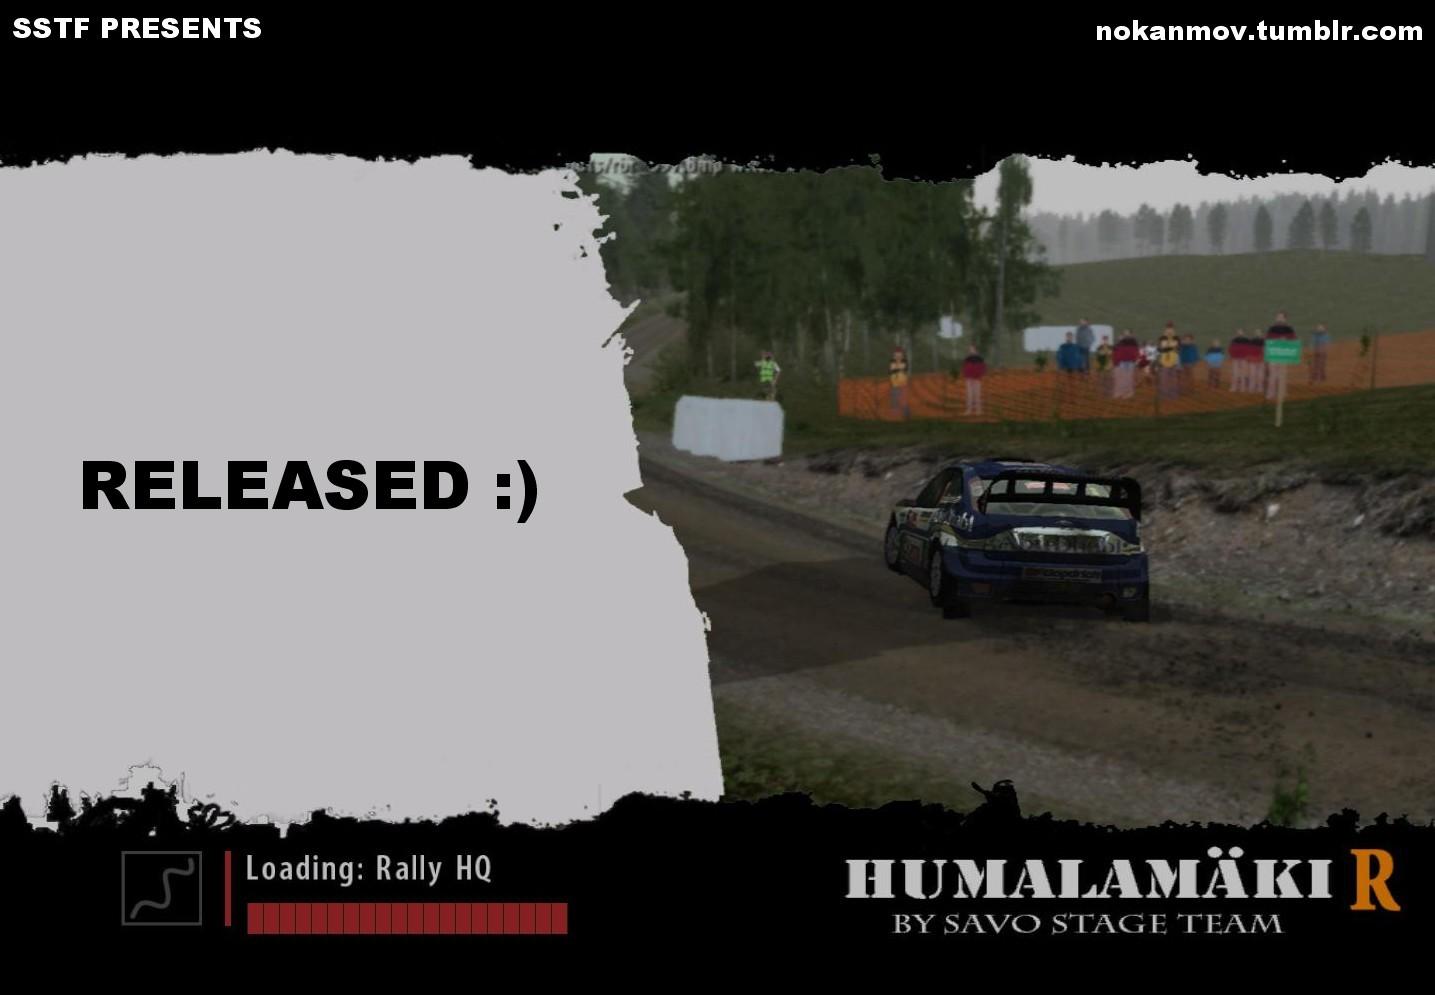 2012-12-06 HUMALAMÄKI R LOADING 4.jpg